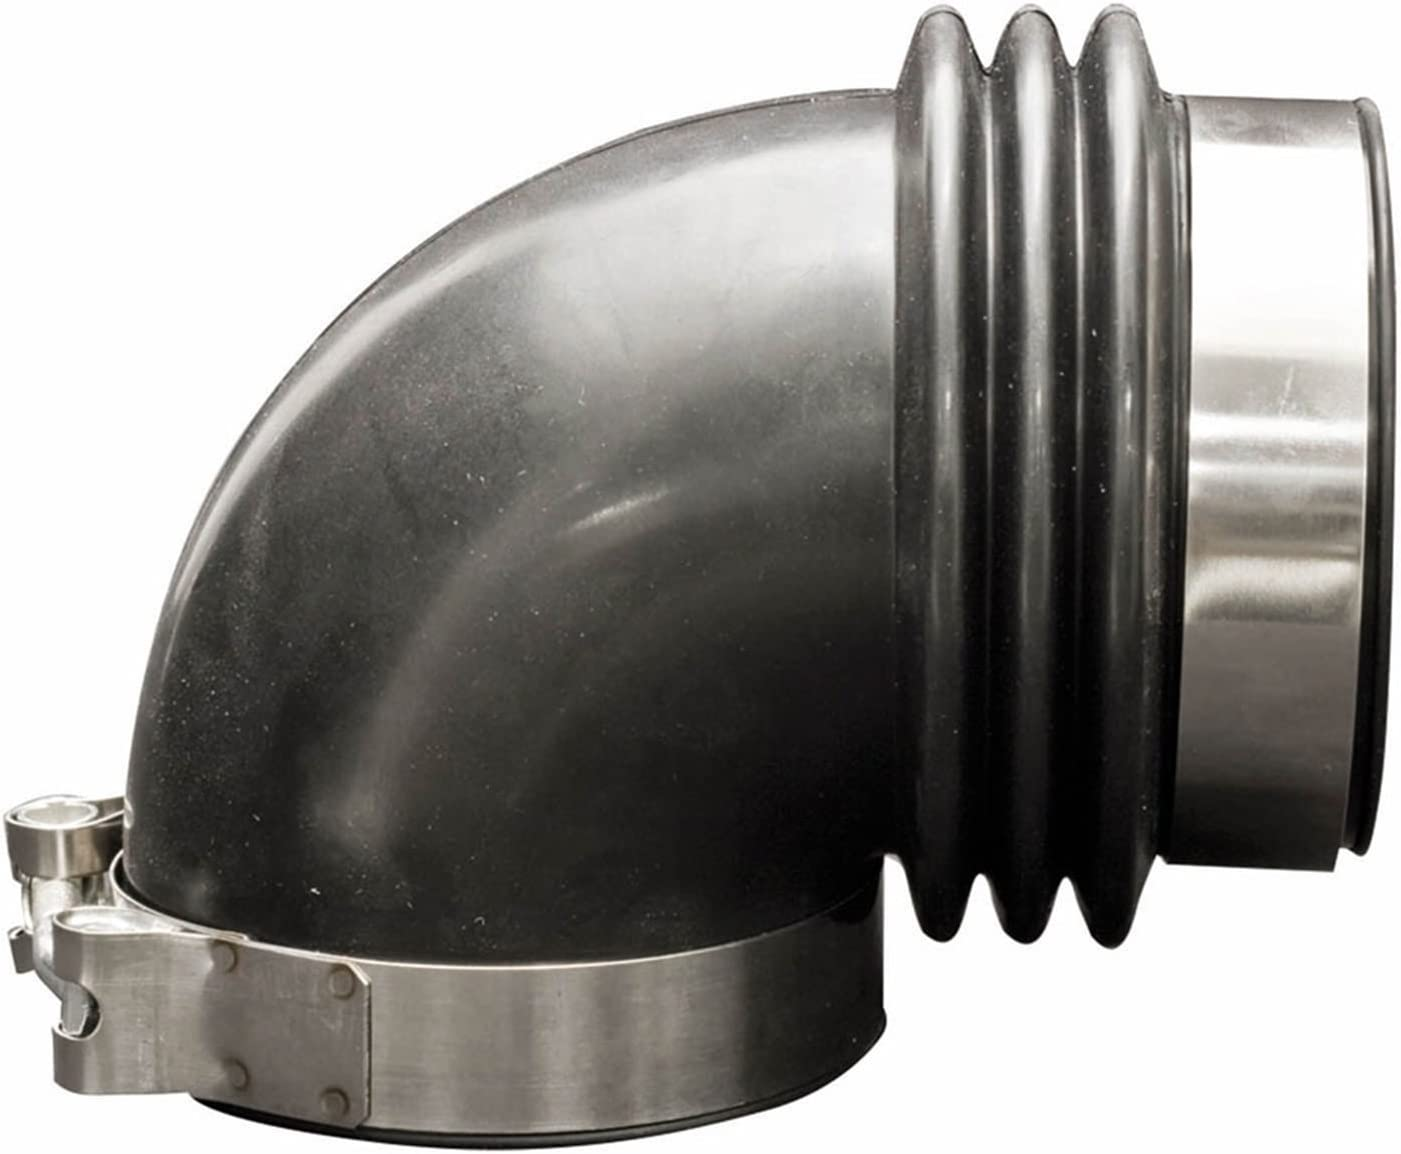 "pipe 8711 Spectre Attach To Tube 3/"" Air Intake Vacuum Sensor Adapter Kit"